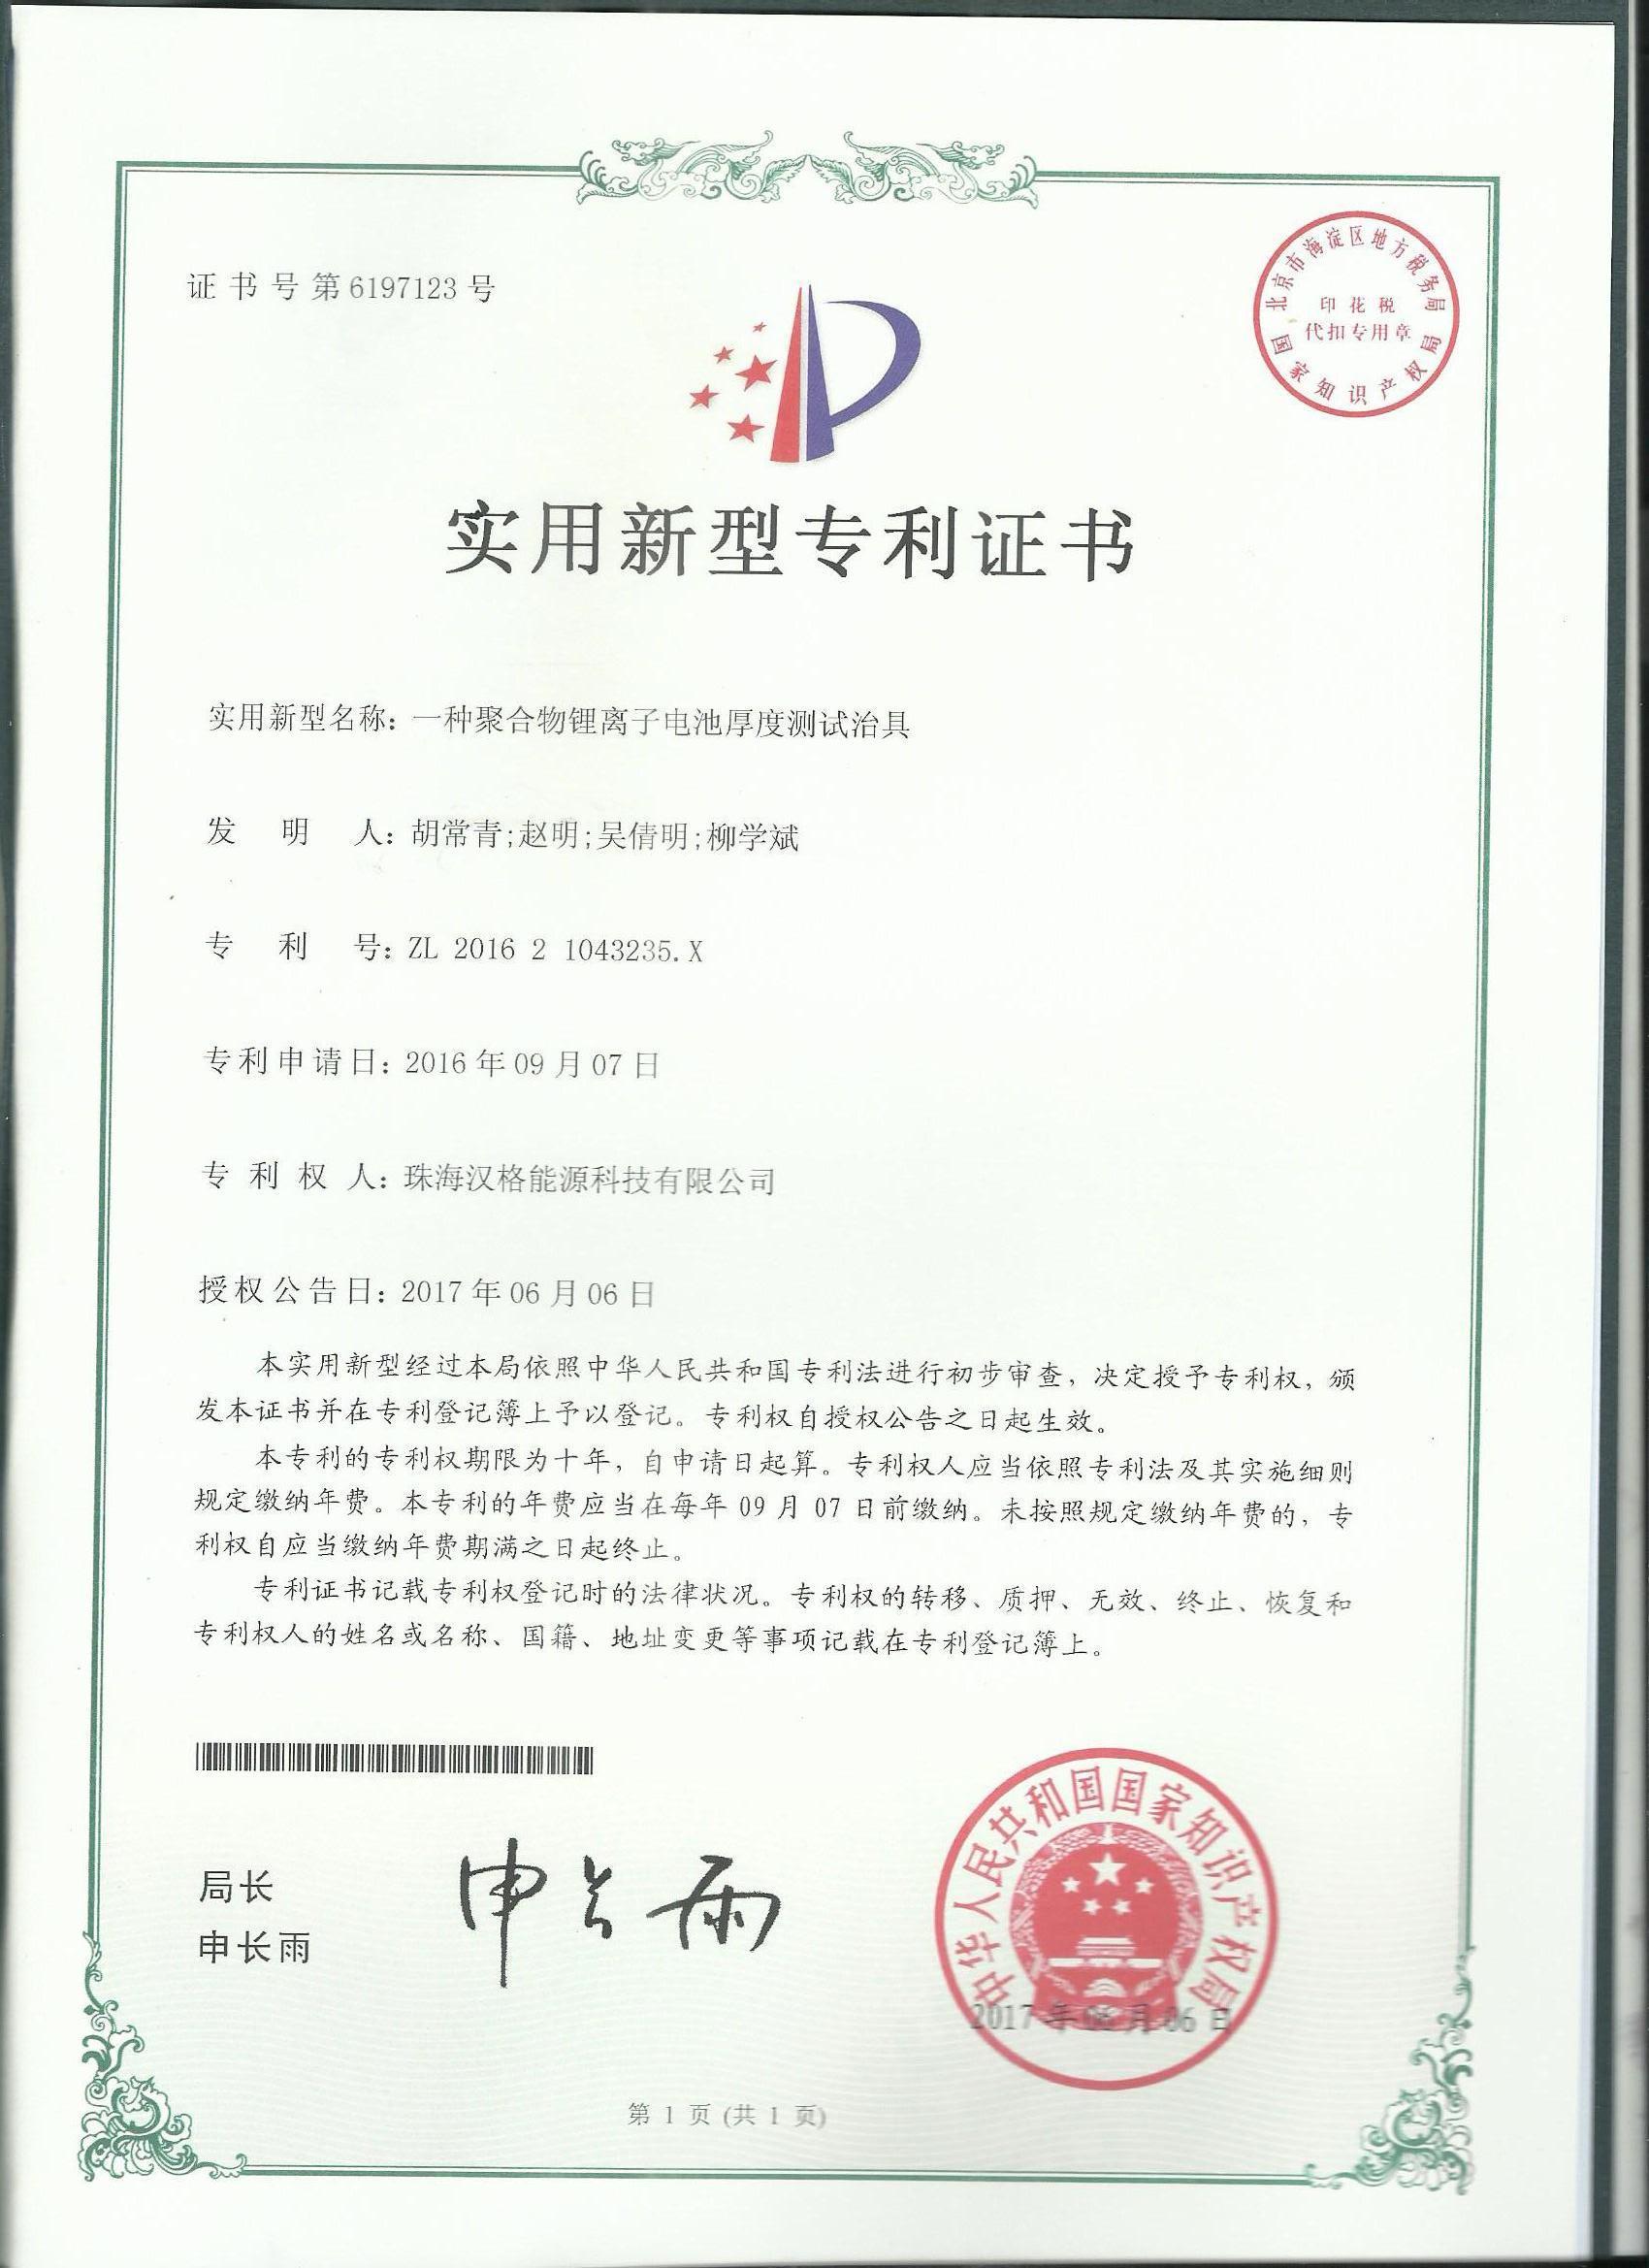 Utility model patent certificate 13